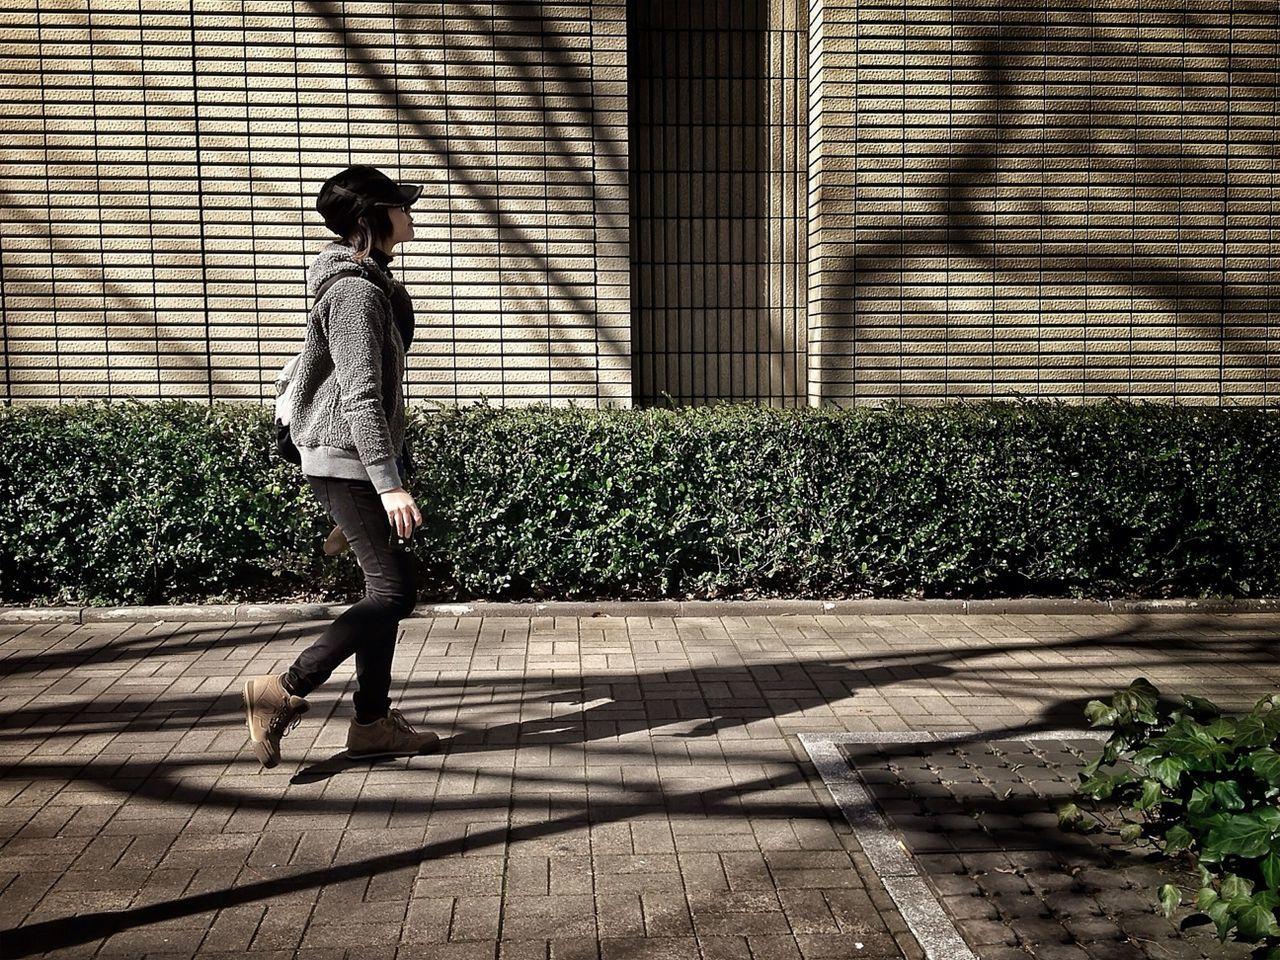 Streetphotography Schattenspiel